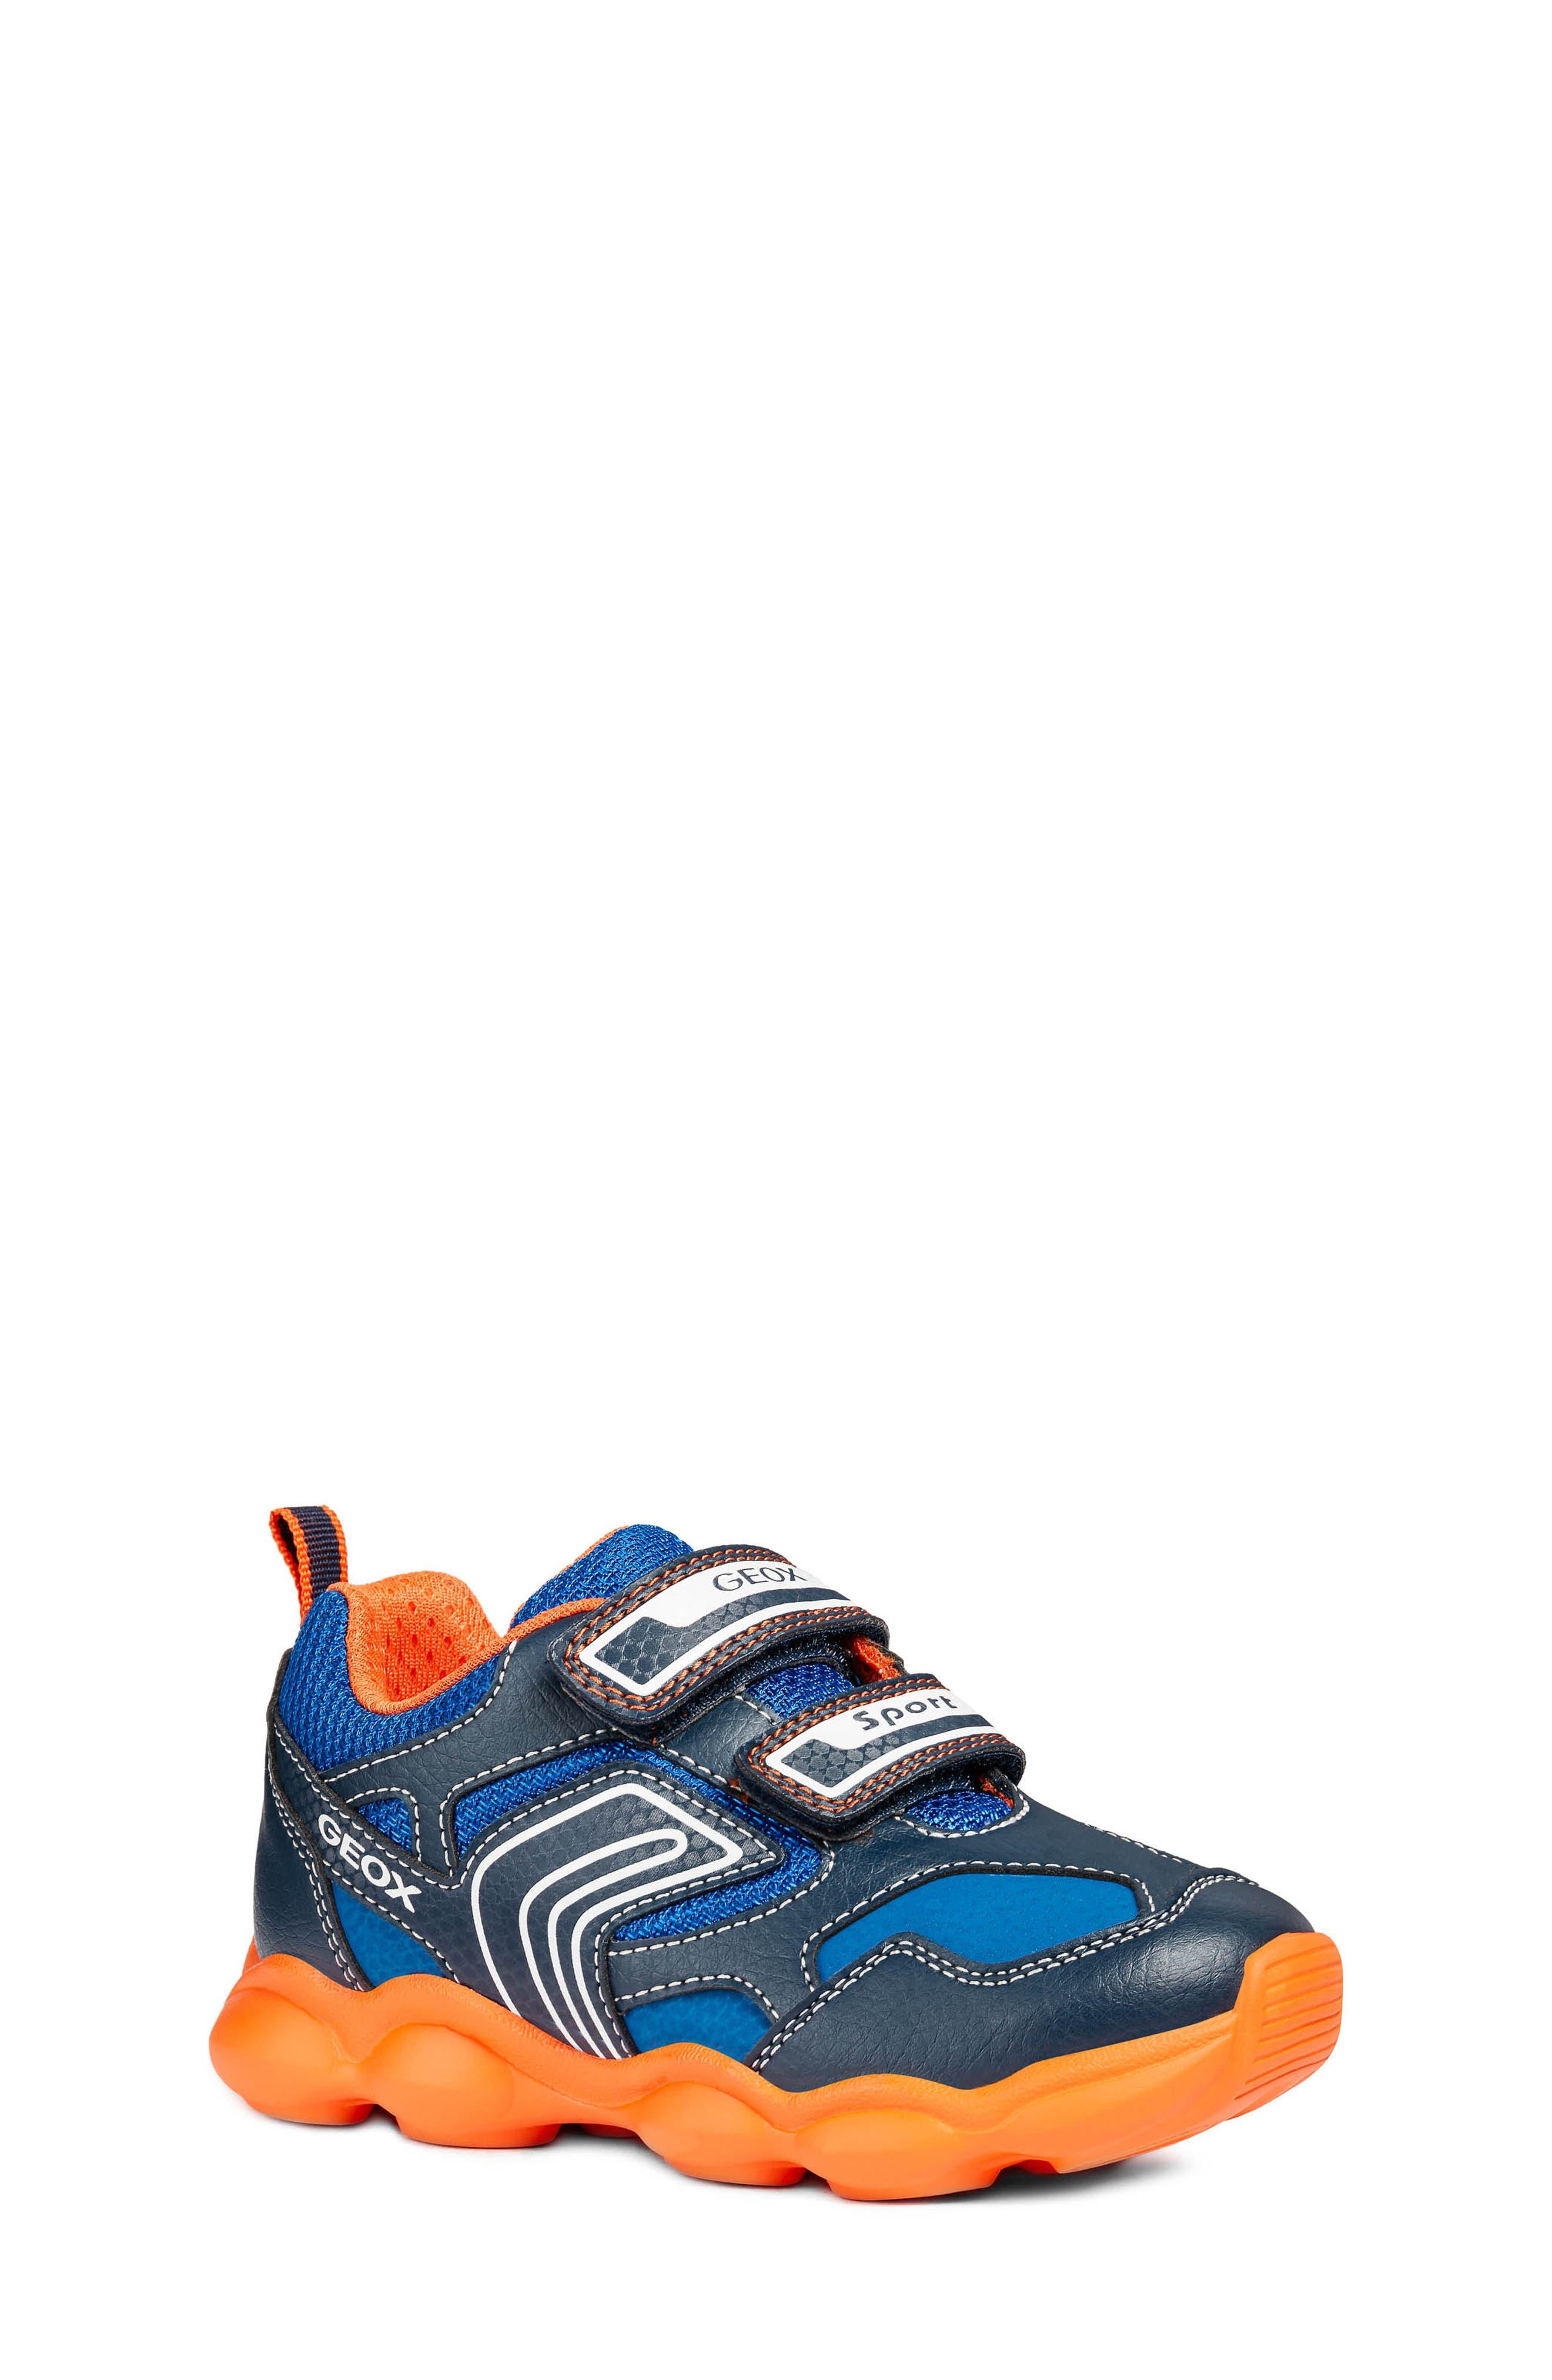 Munfrey Sneaker,                         Main,                         color, Navy Blue/Orange